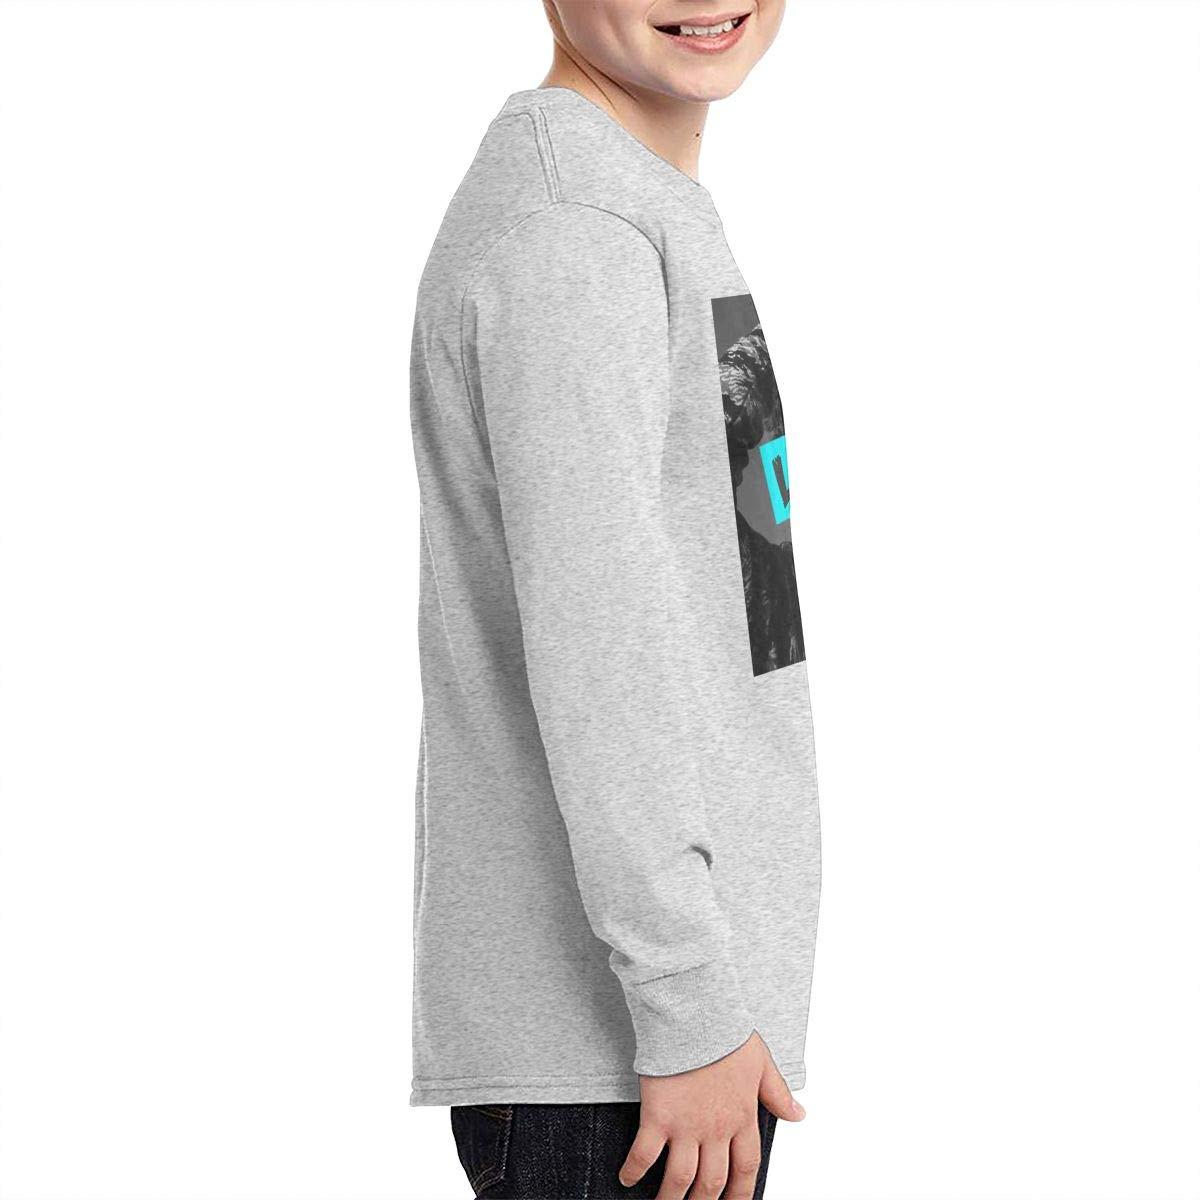 TWOSKILL Youth Lil-Skies Long Sleeves Shirt Boys Girls